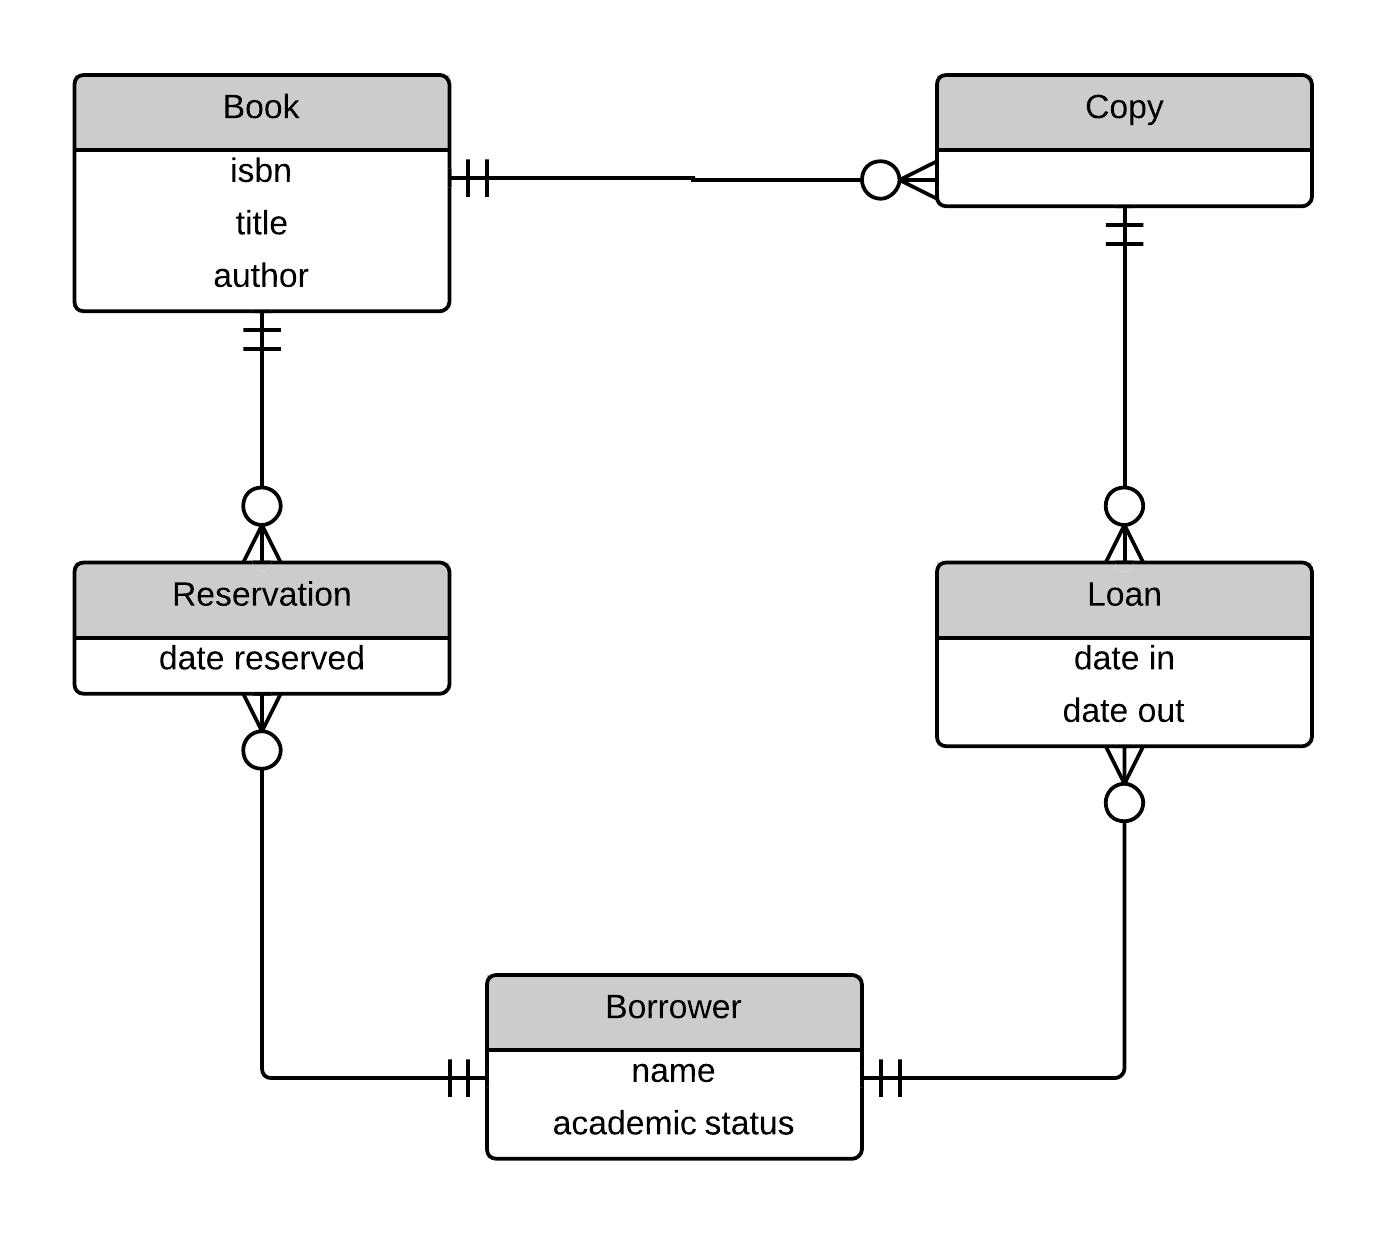 Designing Warehouses, Libraries, And Car Rentals   James T Vu throughout Er Diagram Car